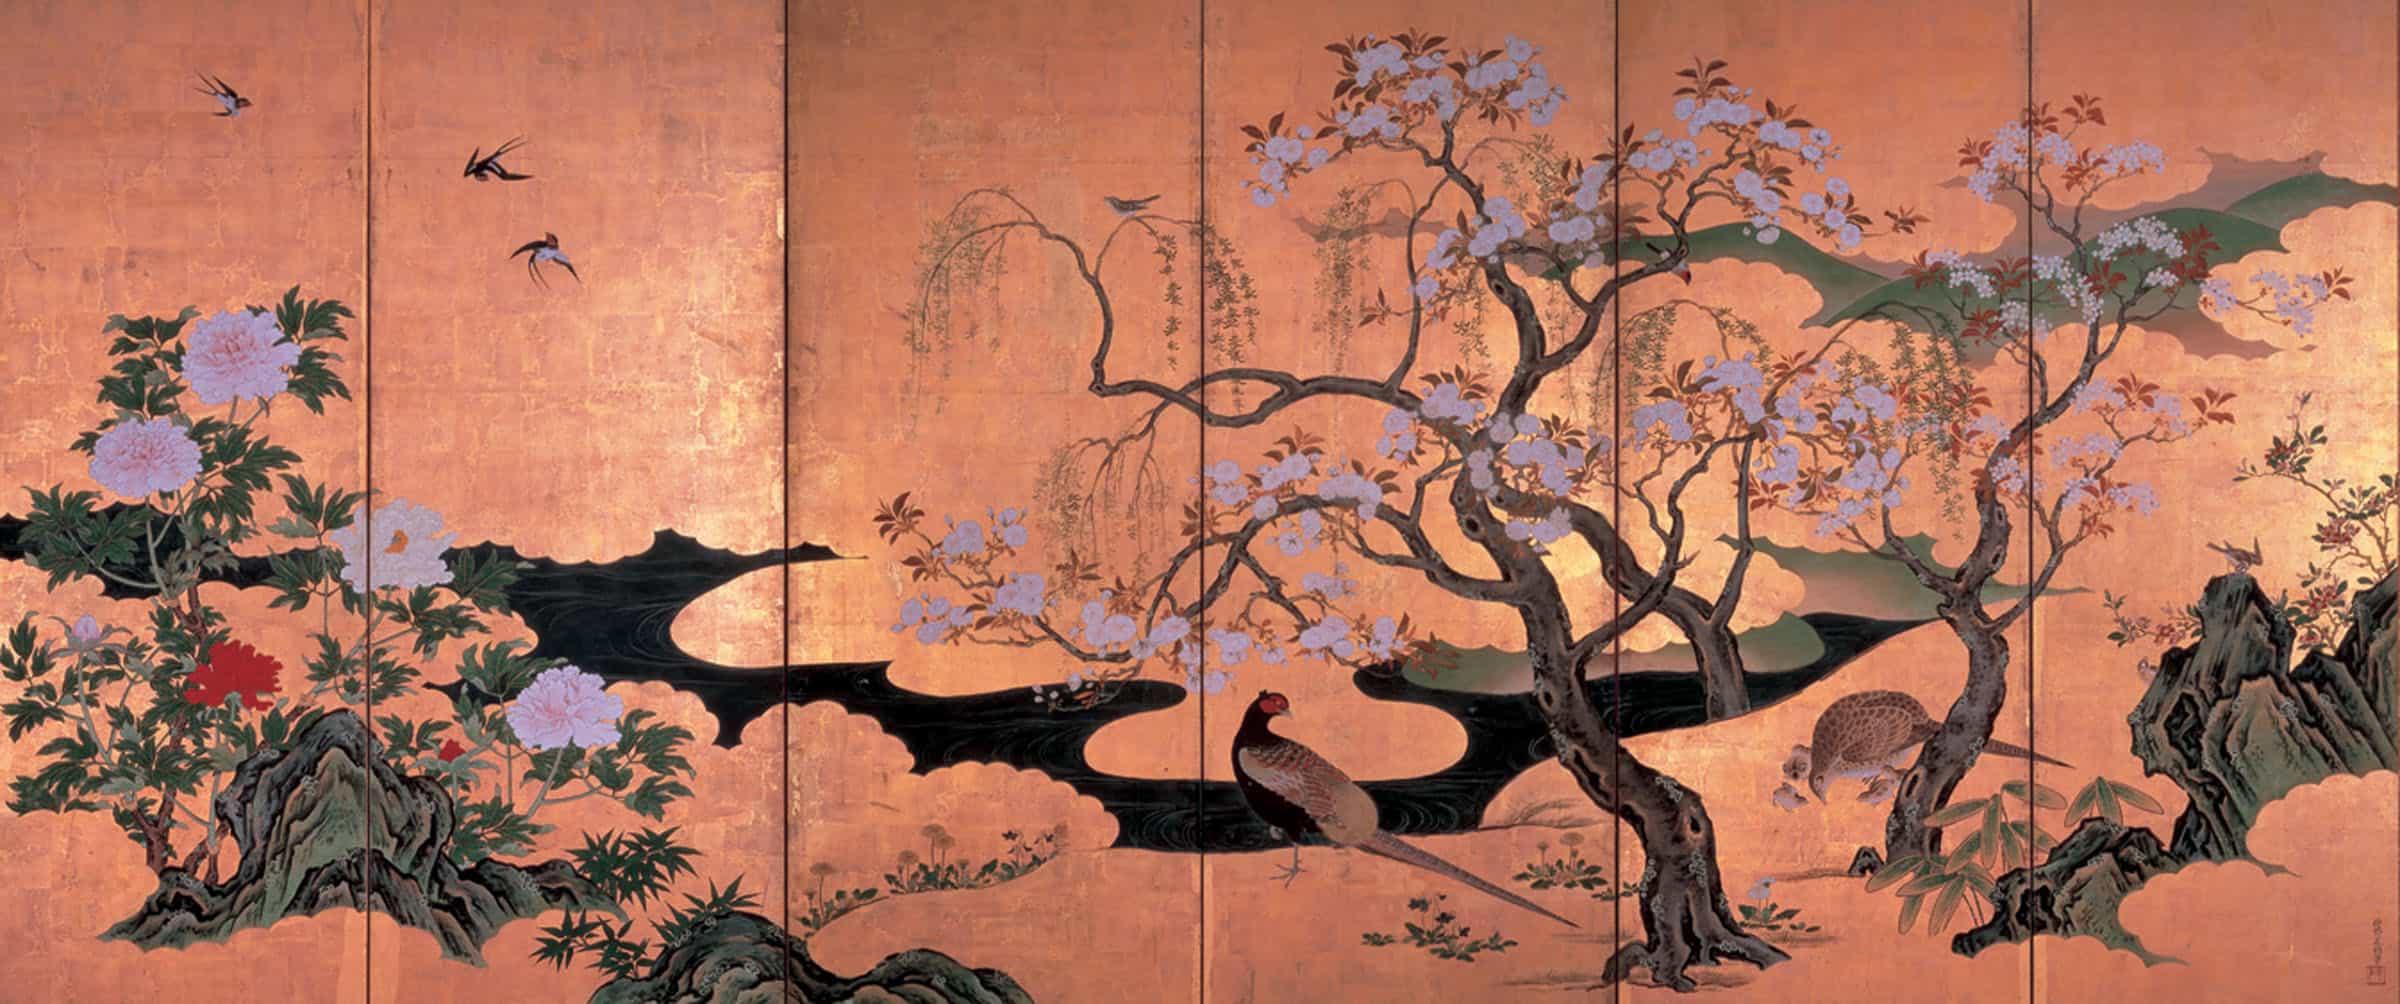 Photo of أربع قصائد يابانيّة ـــ شعر: تاكيناكا ايكو[1] ـ ترجمة:.عدنان بغجاتي